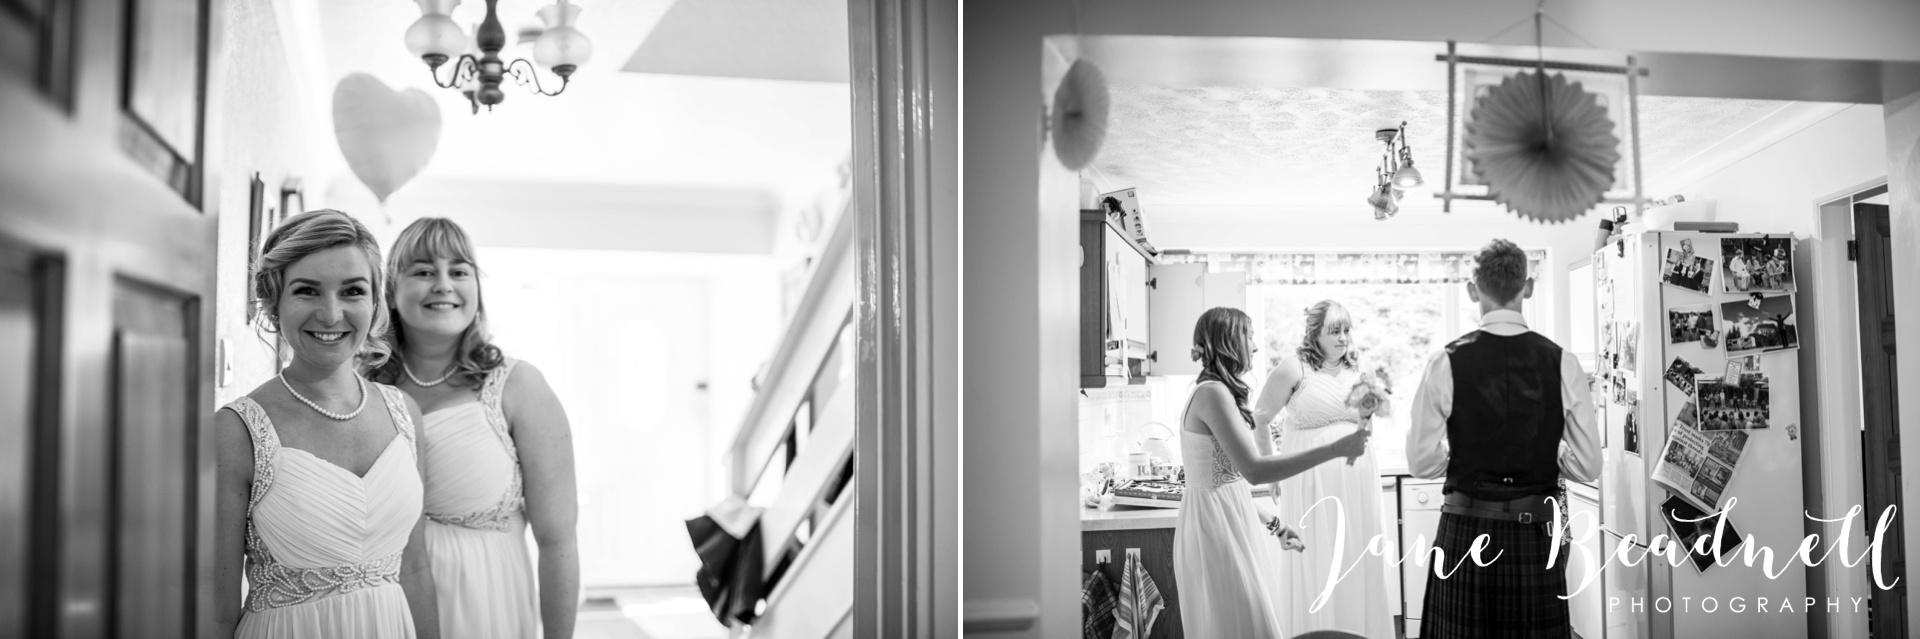 yorkshire-fine-art-wedding-photographer-jane-beadnell-photography-poppleton-york_0009